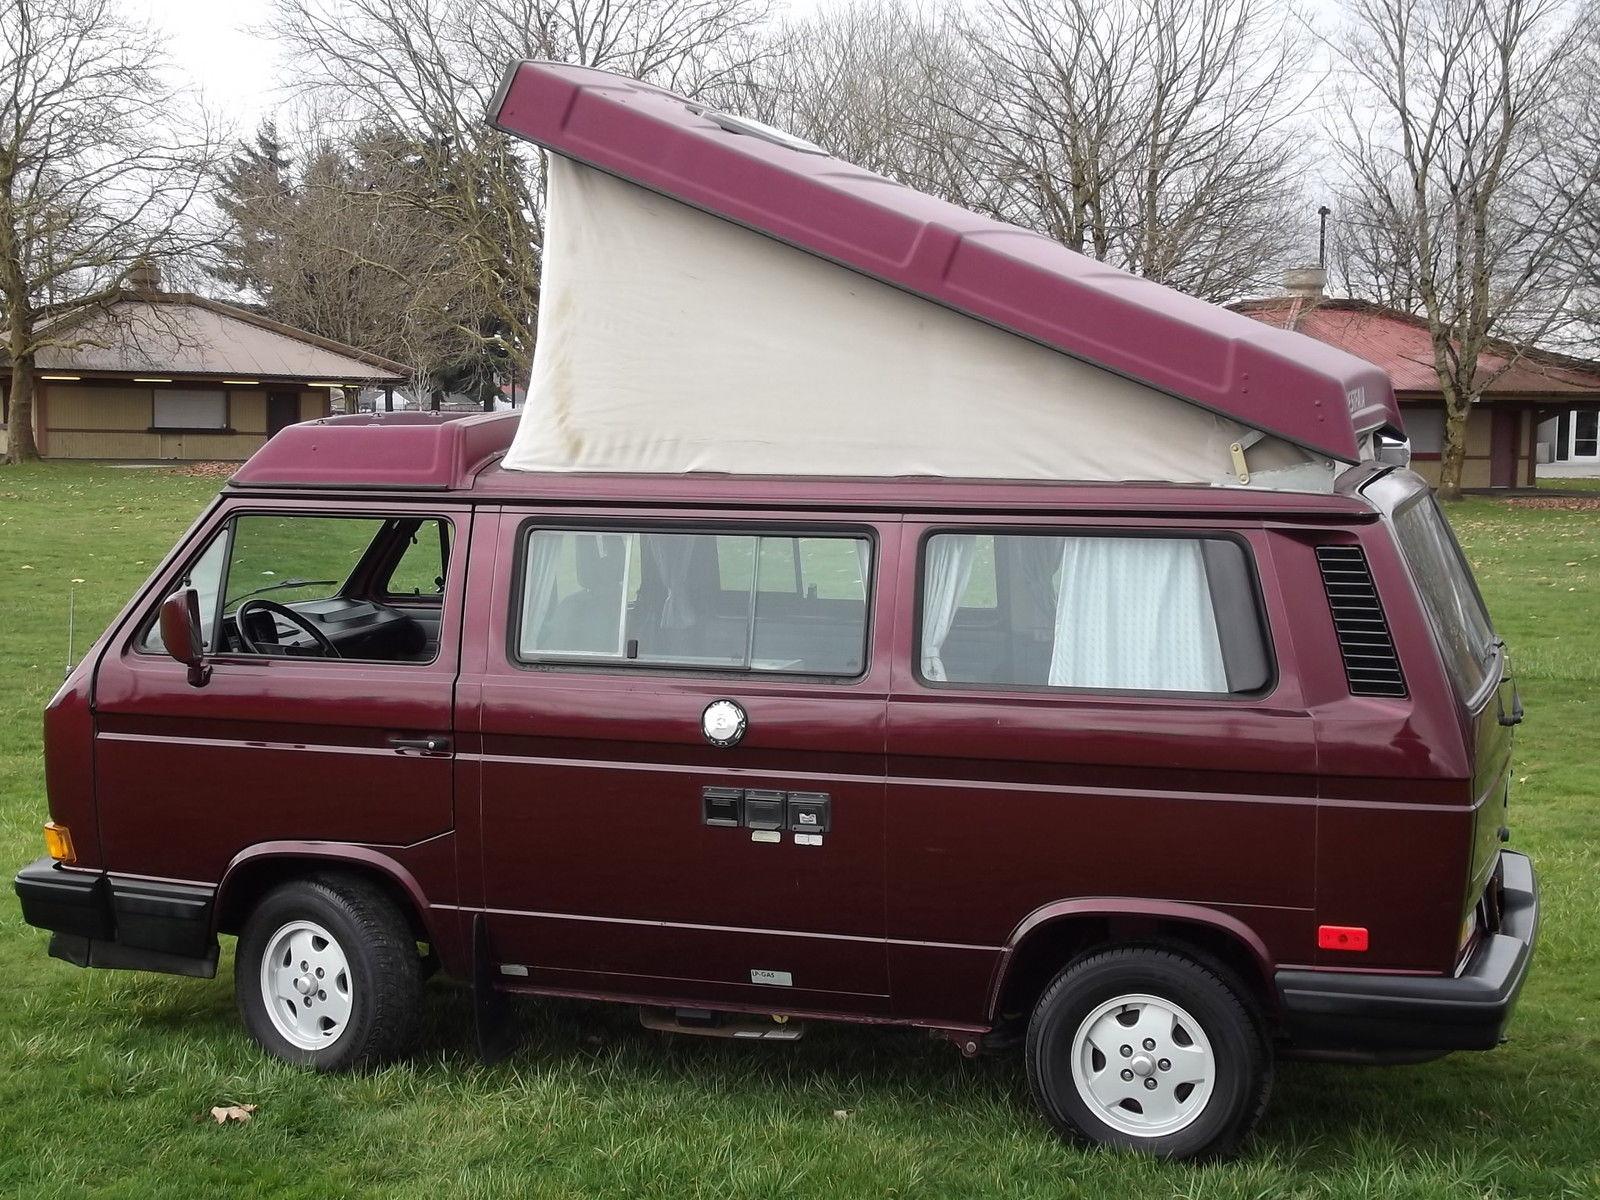 Red 1991 VW Vanagon Westfalia Camper w/ 2.5L GoWesty Motor, Manual Transmission, Lots Of Extras - Auction Ends 3/22